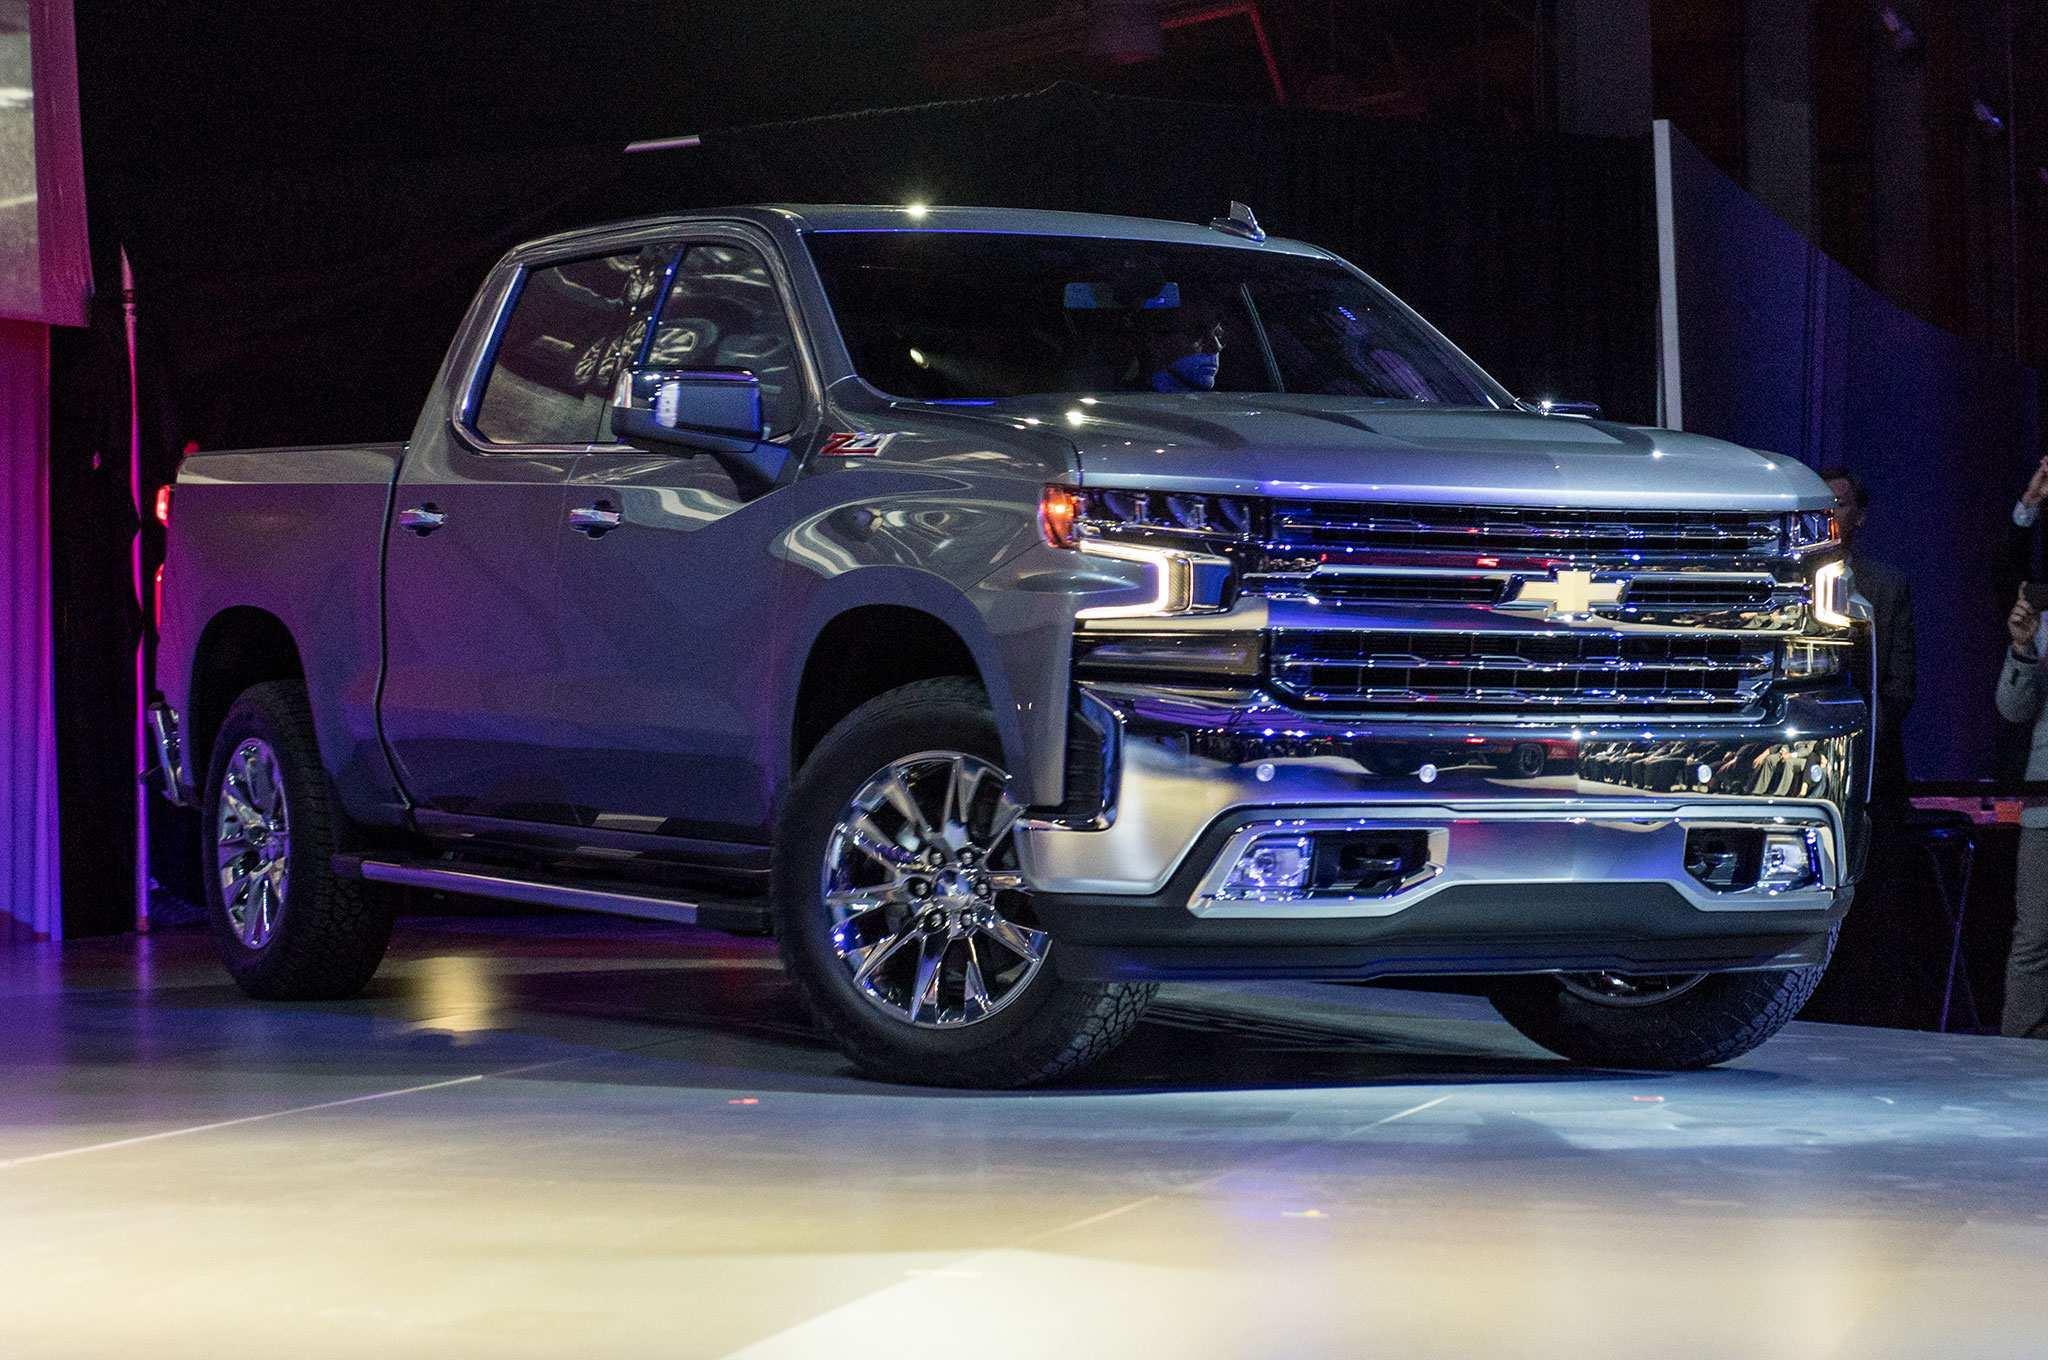 97 All New 2020 Chevrolet Silverado 1500 Ld Images for 2020 Chevrolet Silverado 1500 Ld